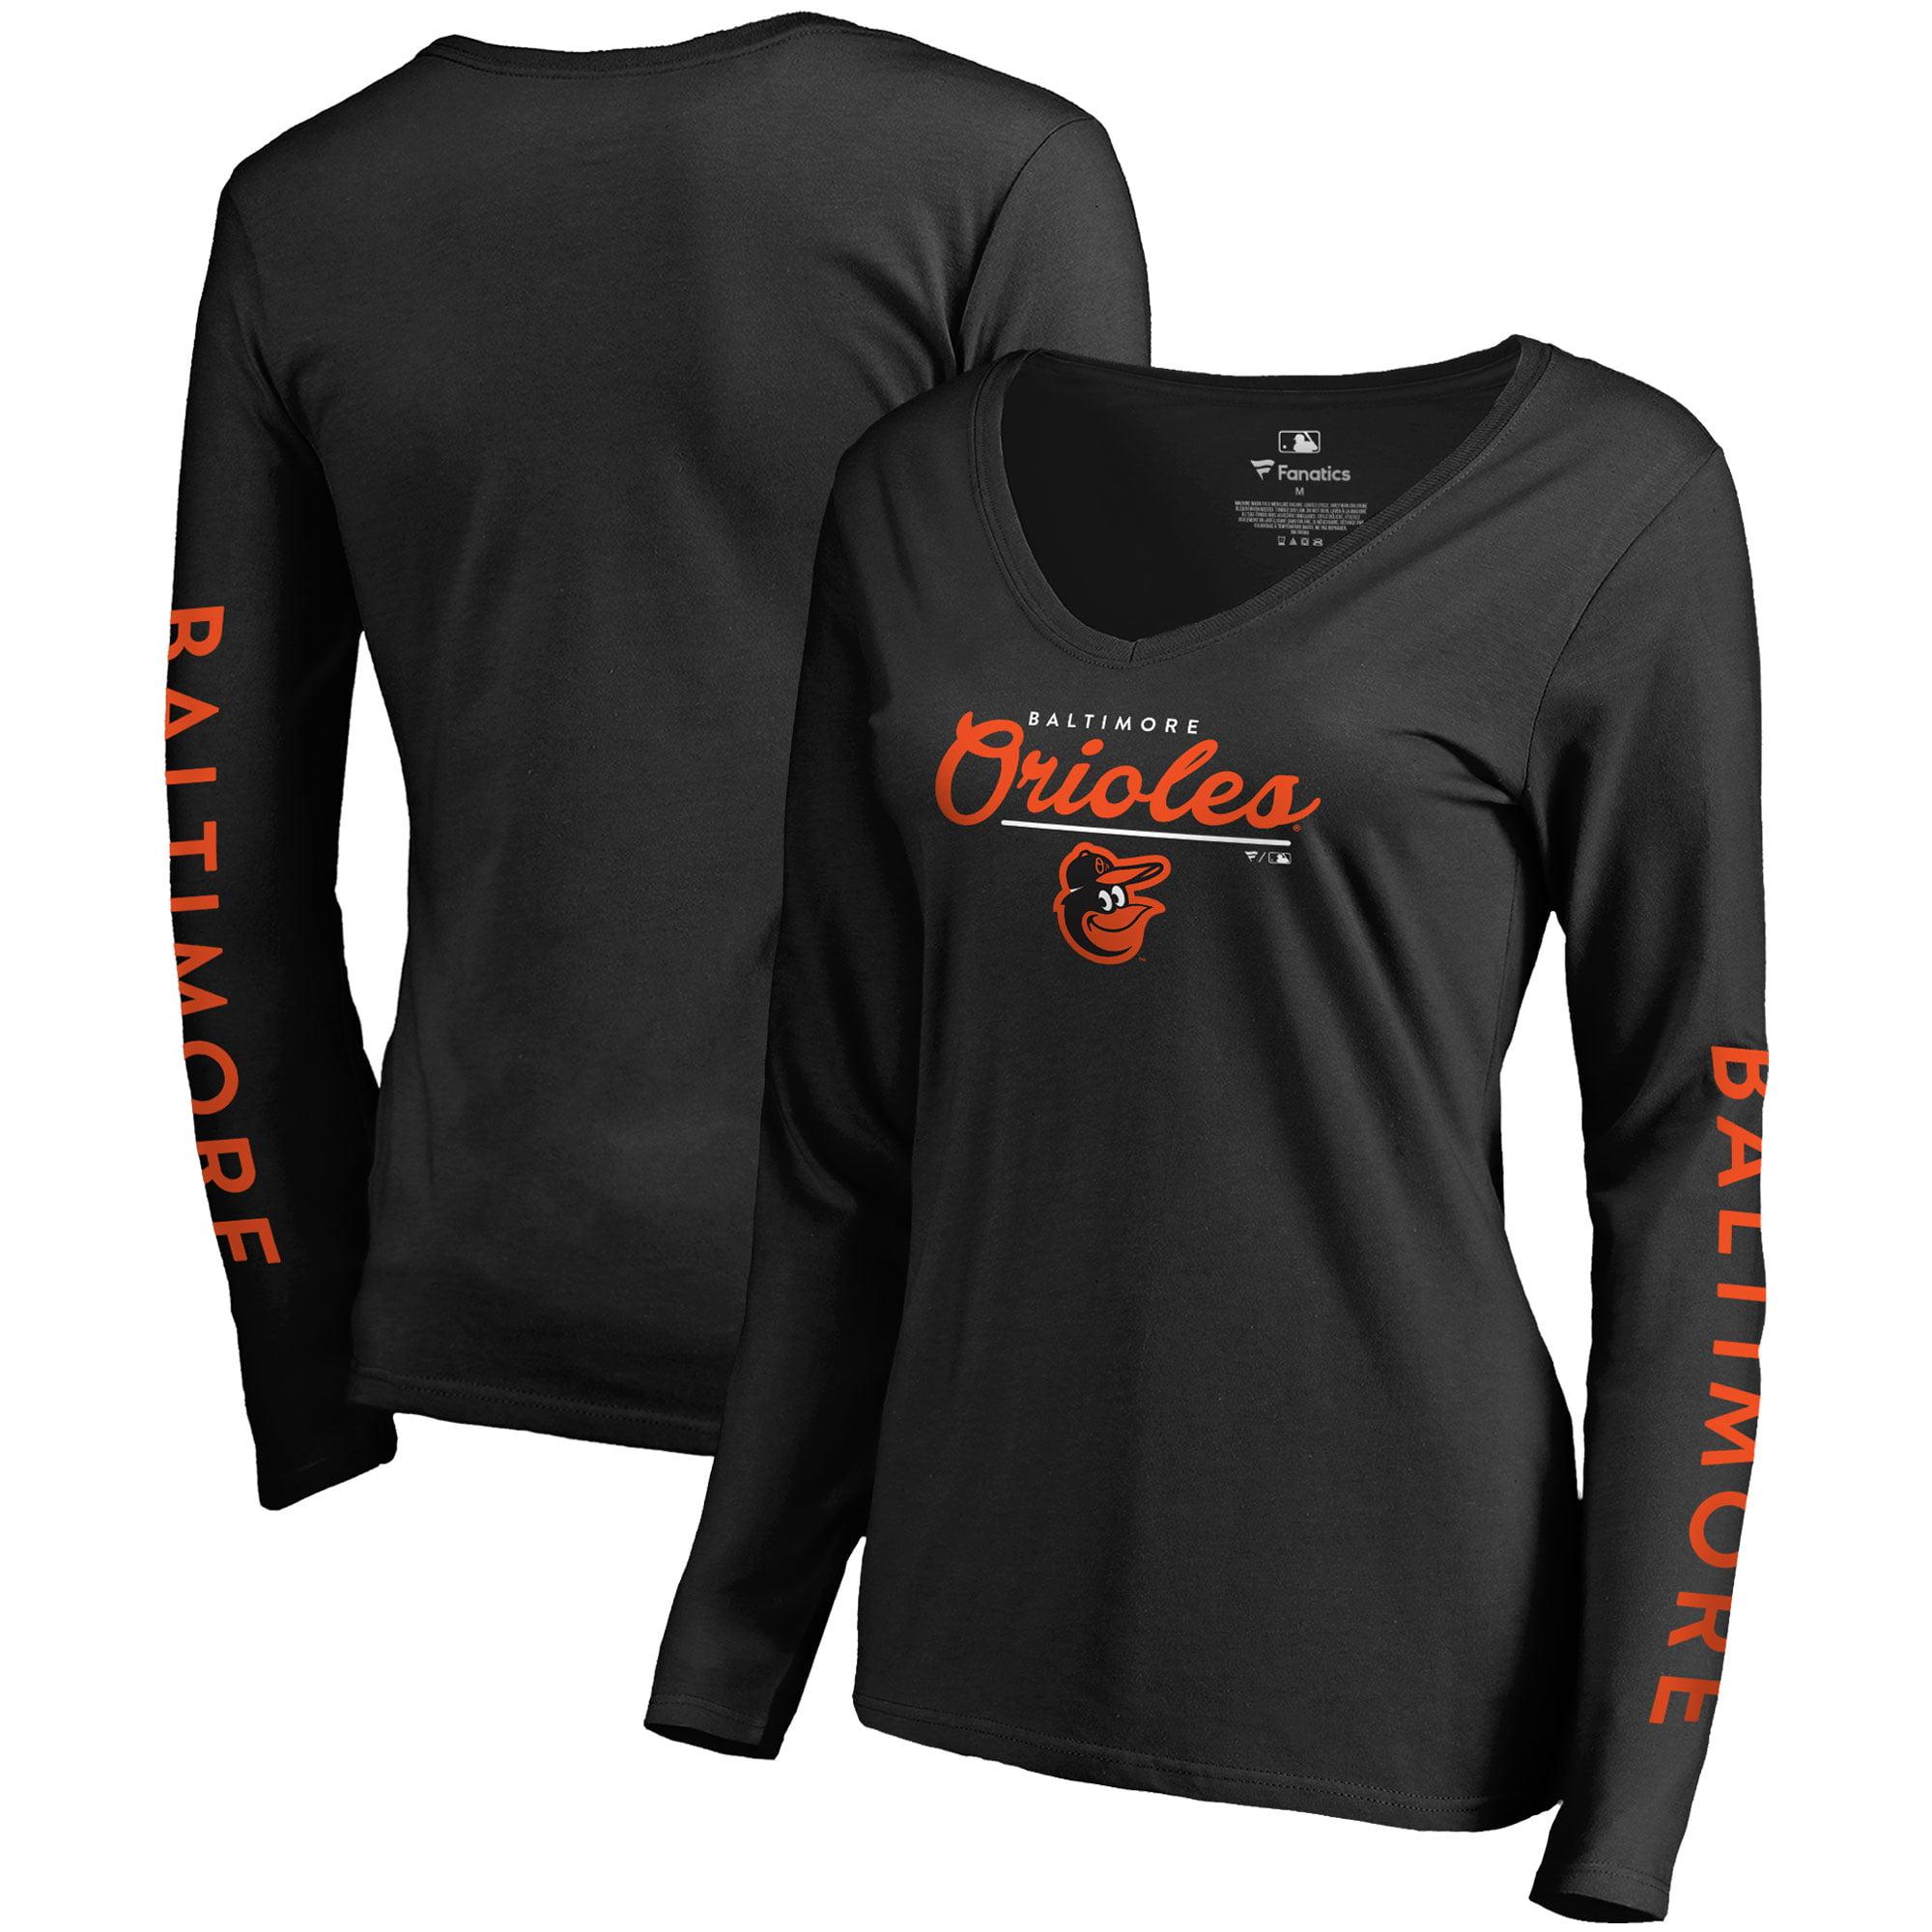 Baltimore Orioles Fanatics Branded Women's High Class Long Sleeve V-Neck T-Shirt - Black